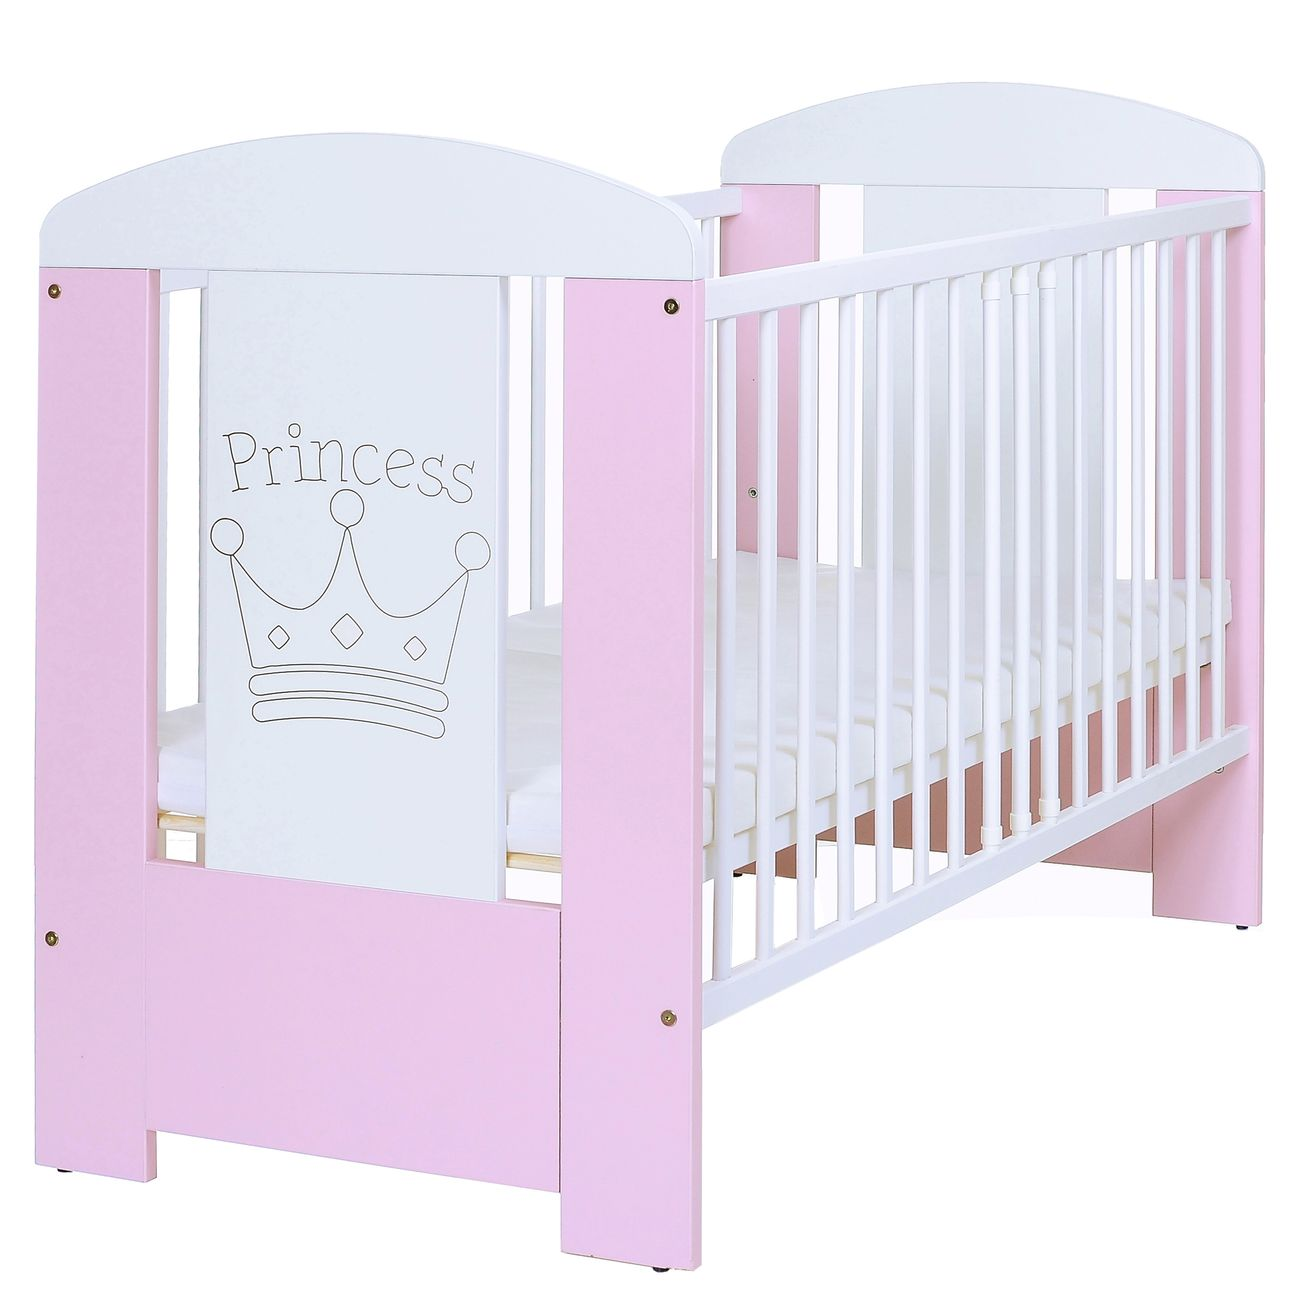 baby kinderbett prinzessin 120x60 holz gitter komplettzimmer matratze weiss rosa ebay